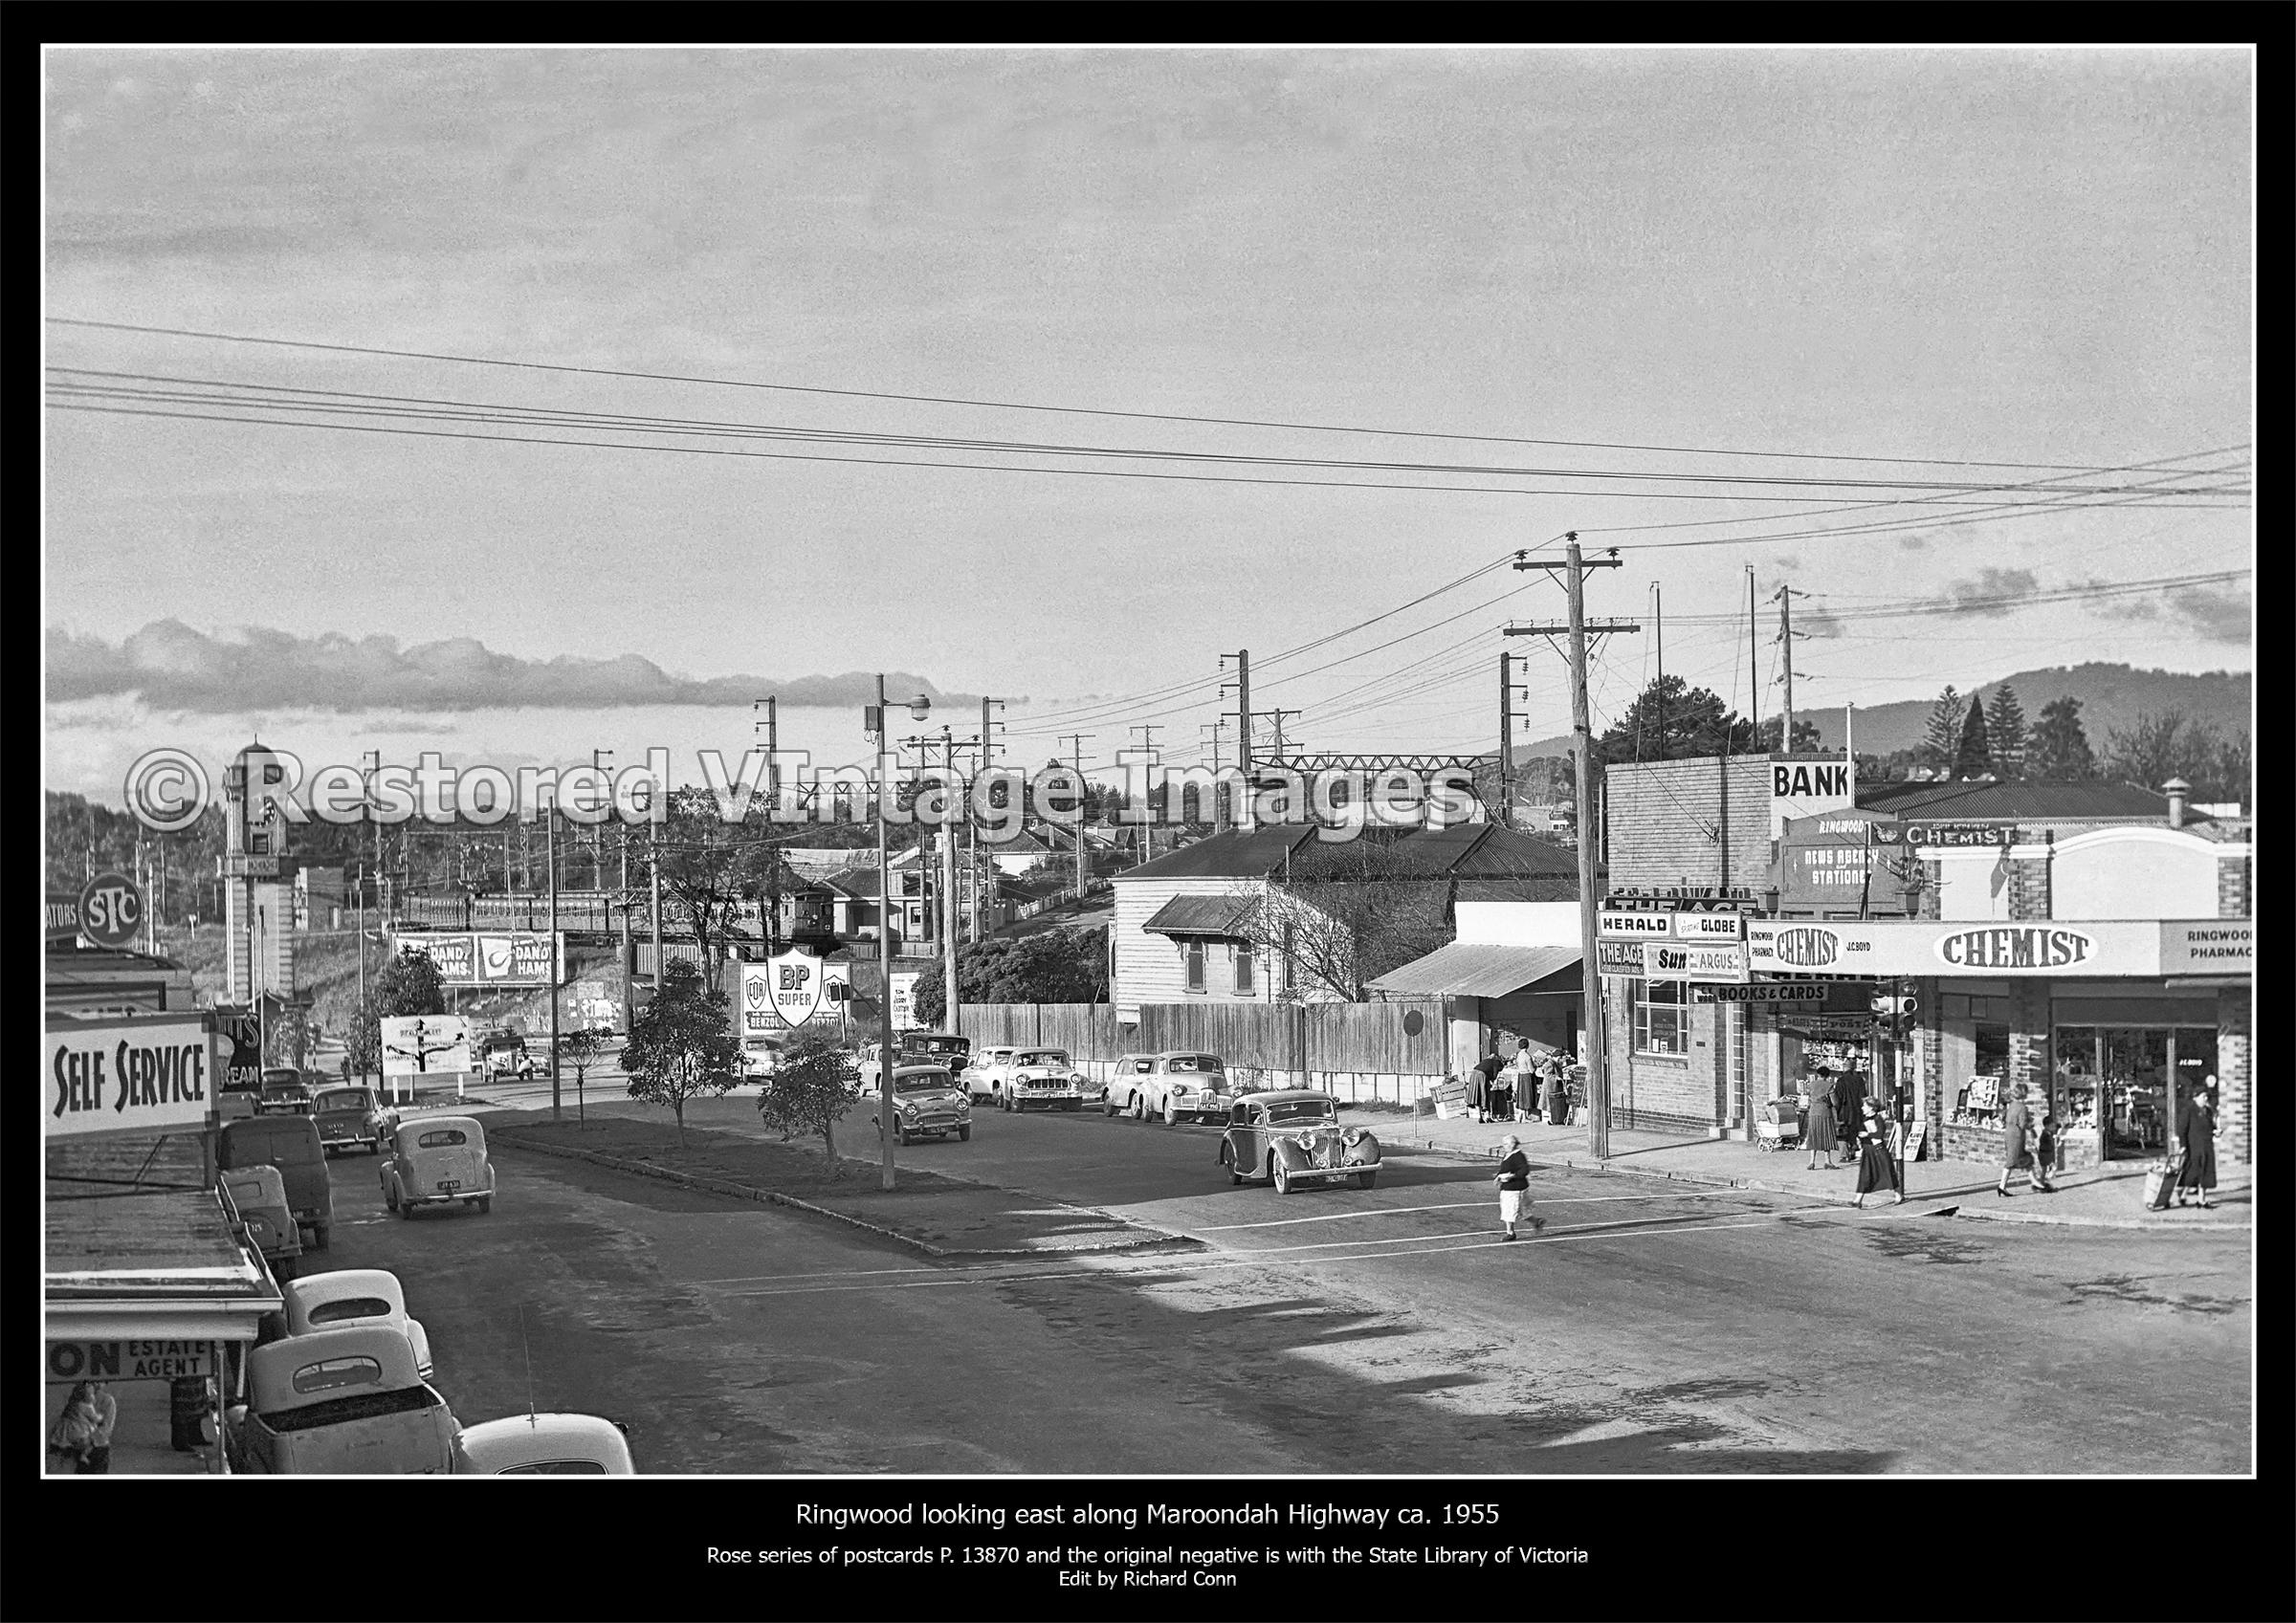 Ringwood Looking East On Maroondah Highway